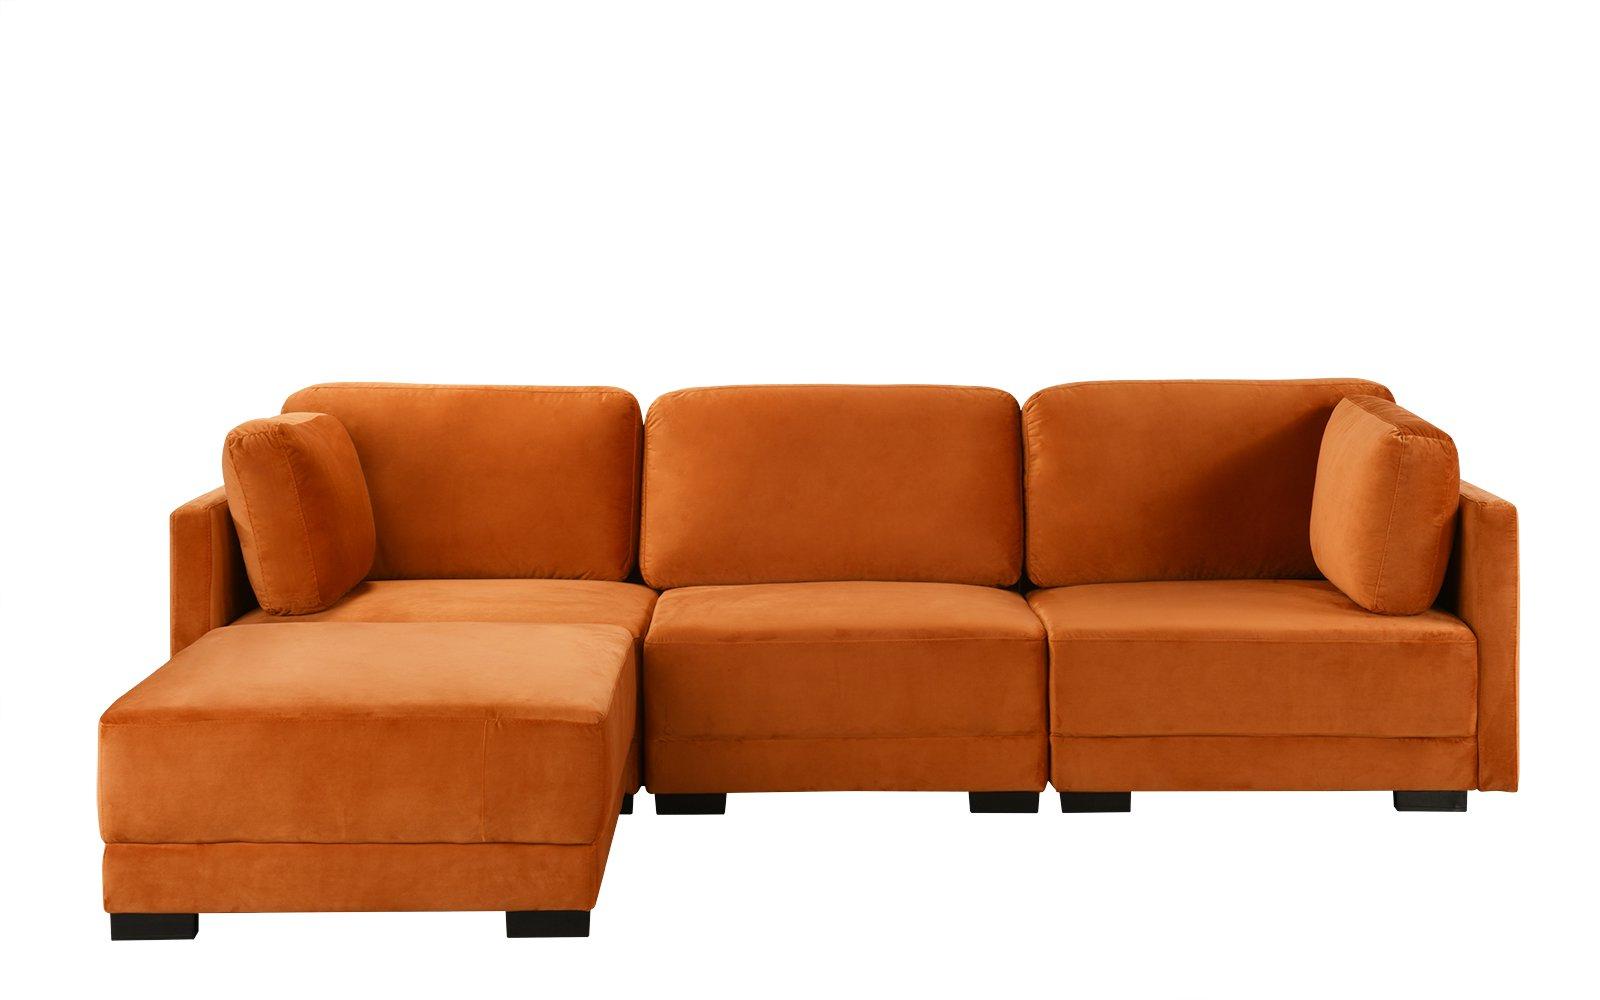 Famous Florence Mid Century Modern Velvet Left Sectional Sofas With Regard To Orange Upholstered Velvet Sectional Sofa, L Shape Modern (View 3 of 25)